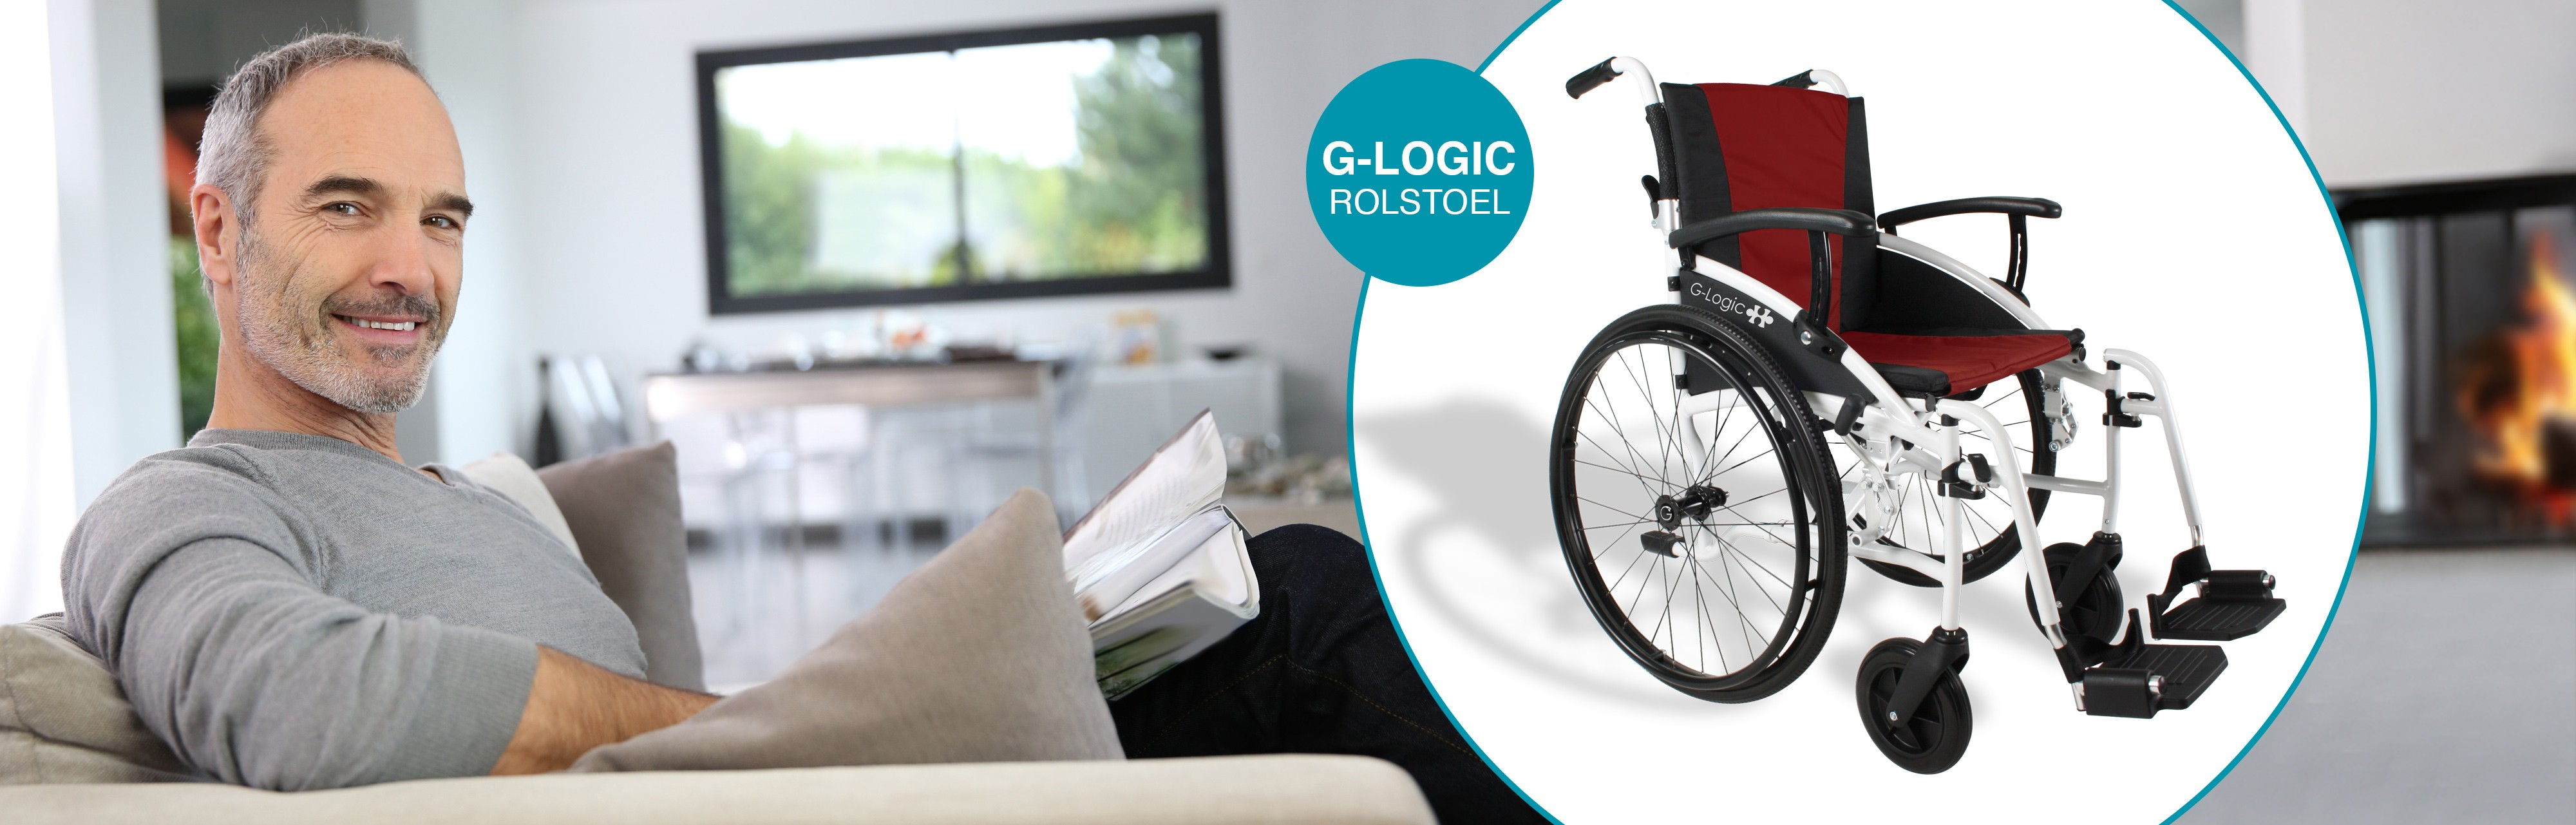 G-Logic rolstoel